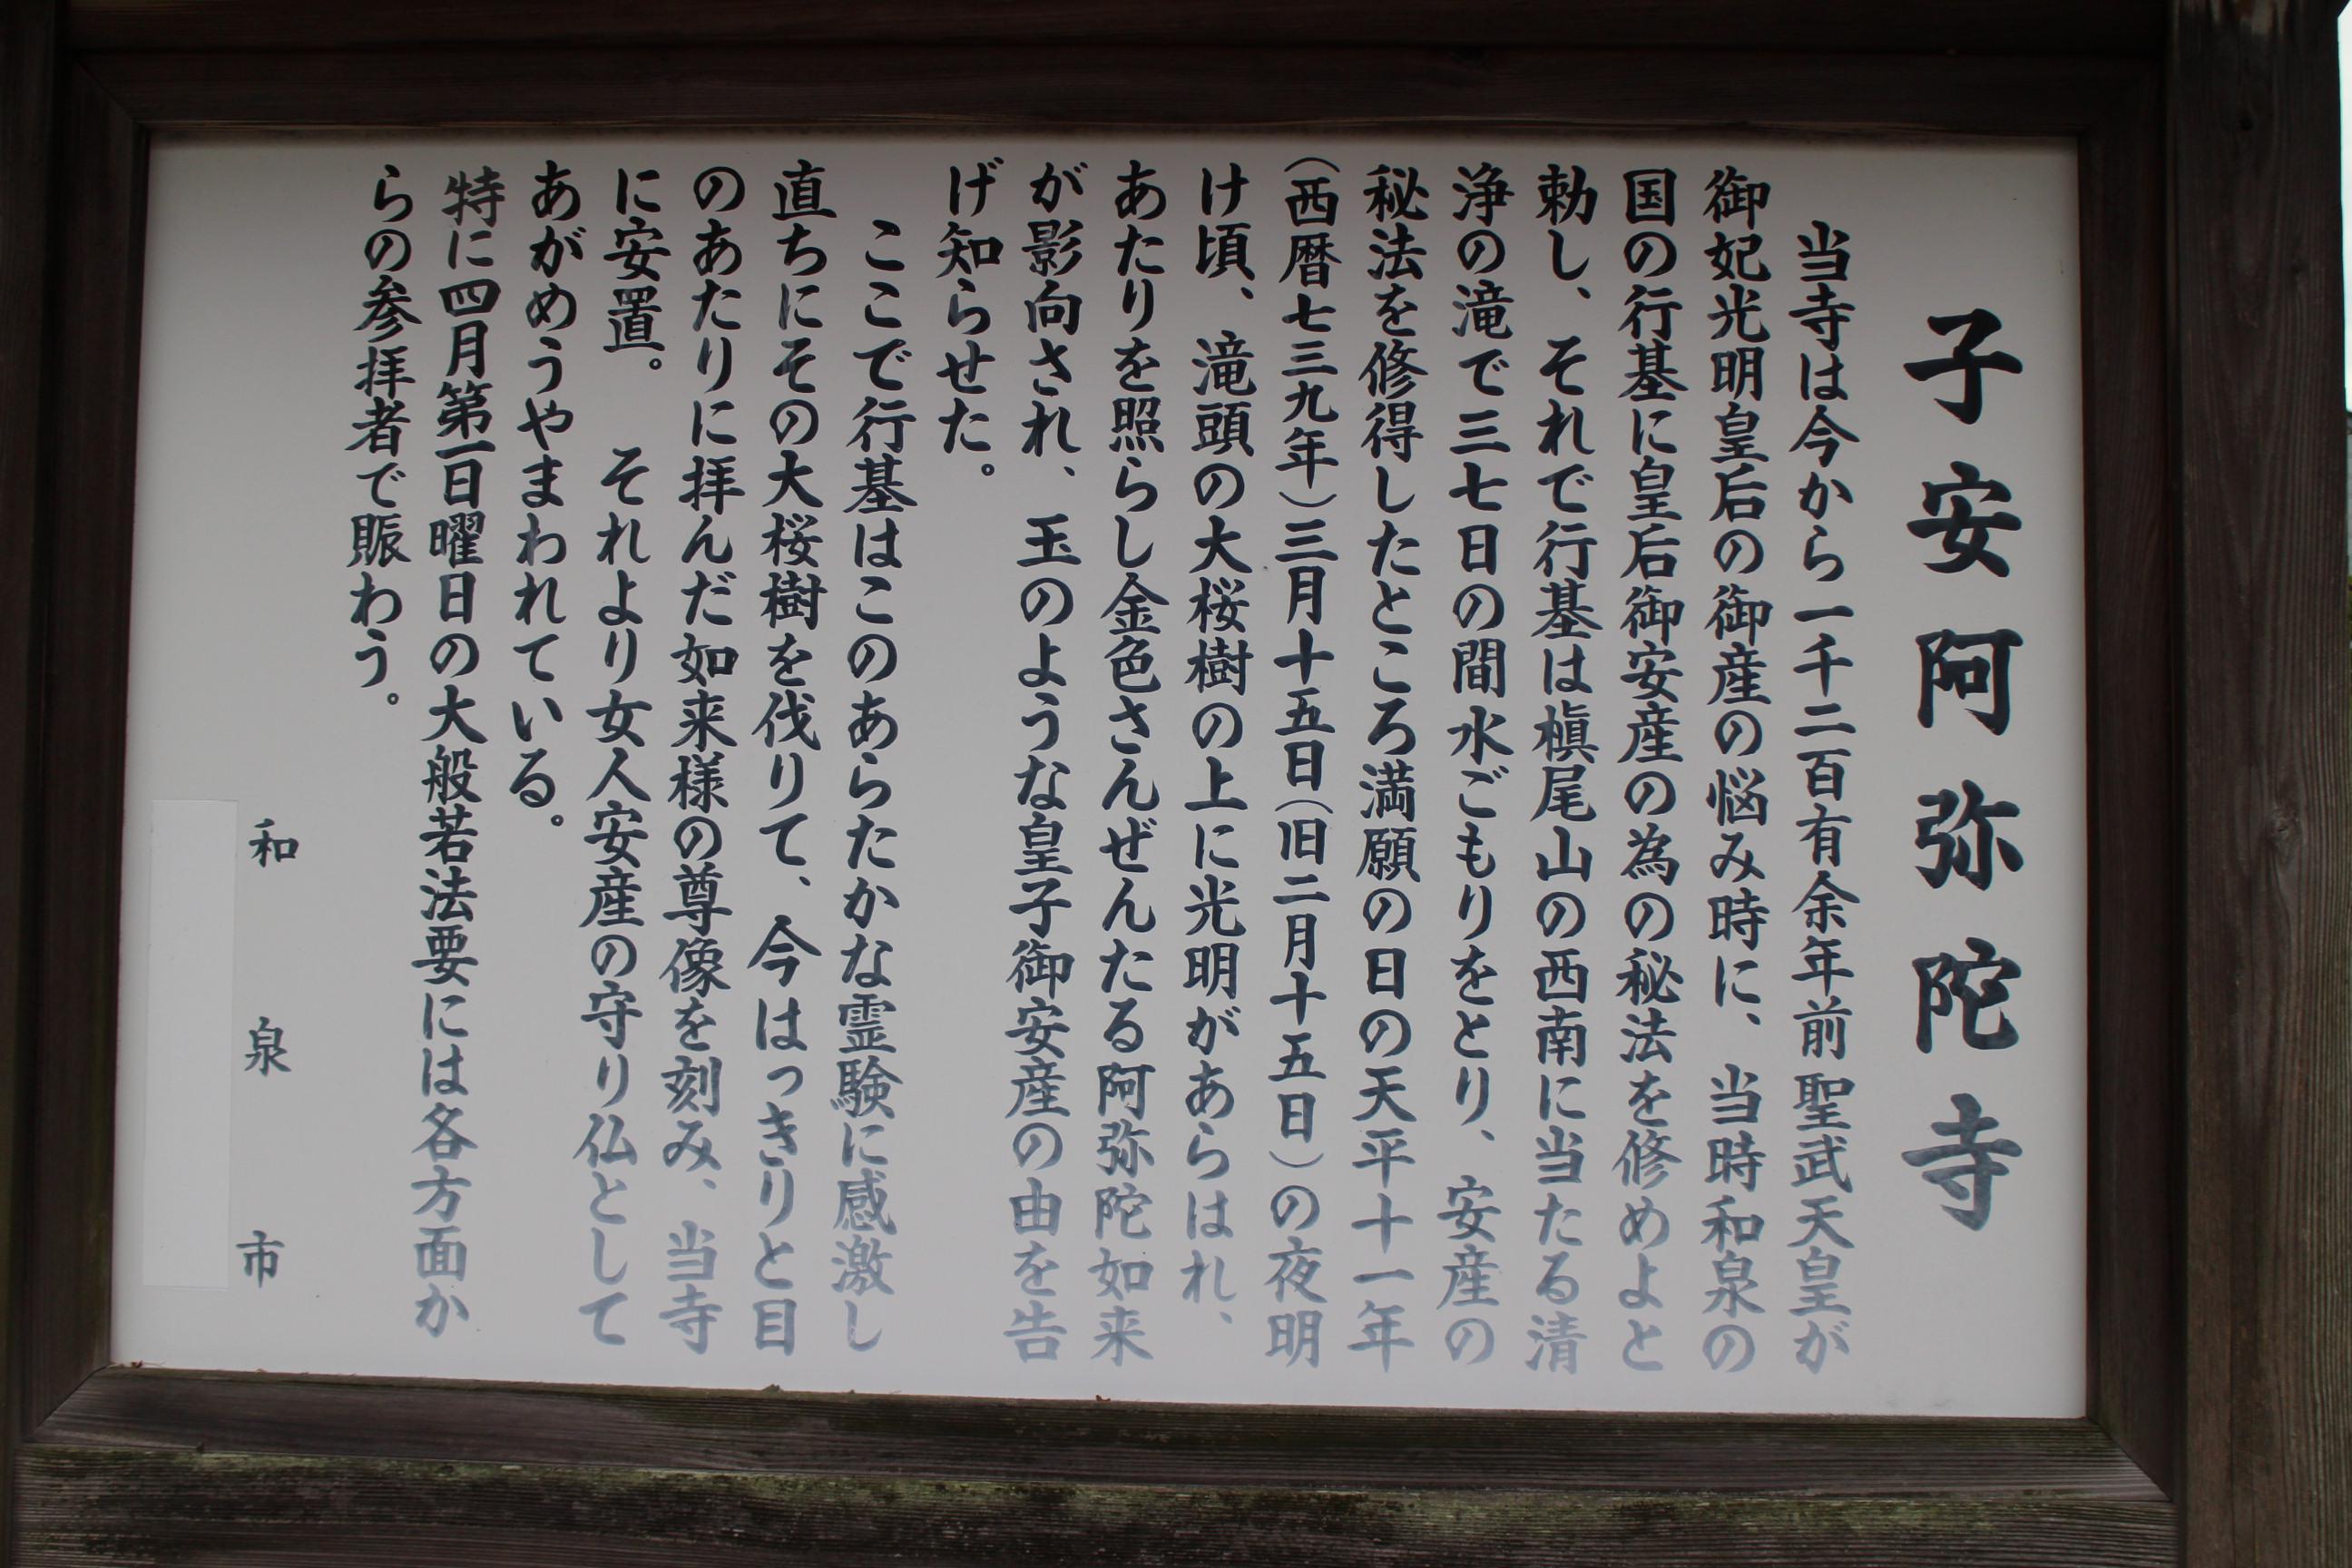 阿弥陀寺の歴史